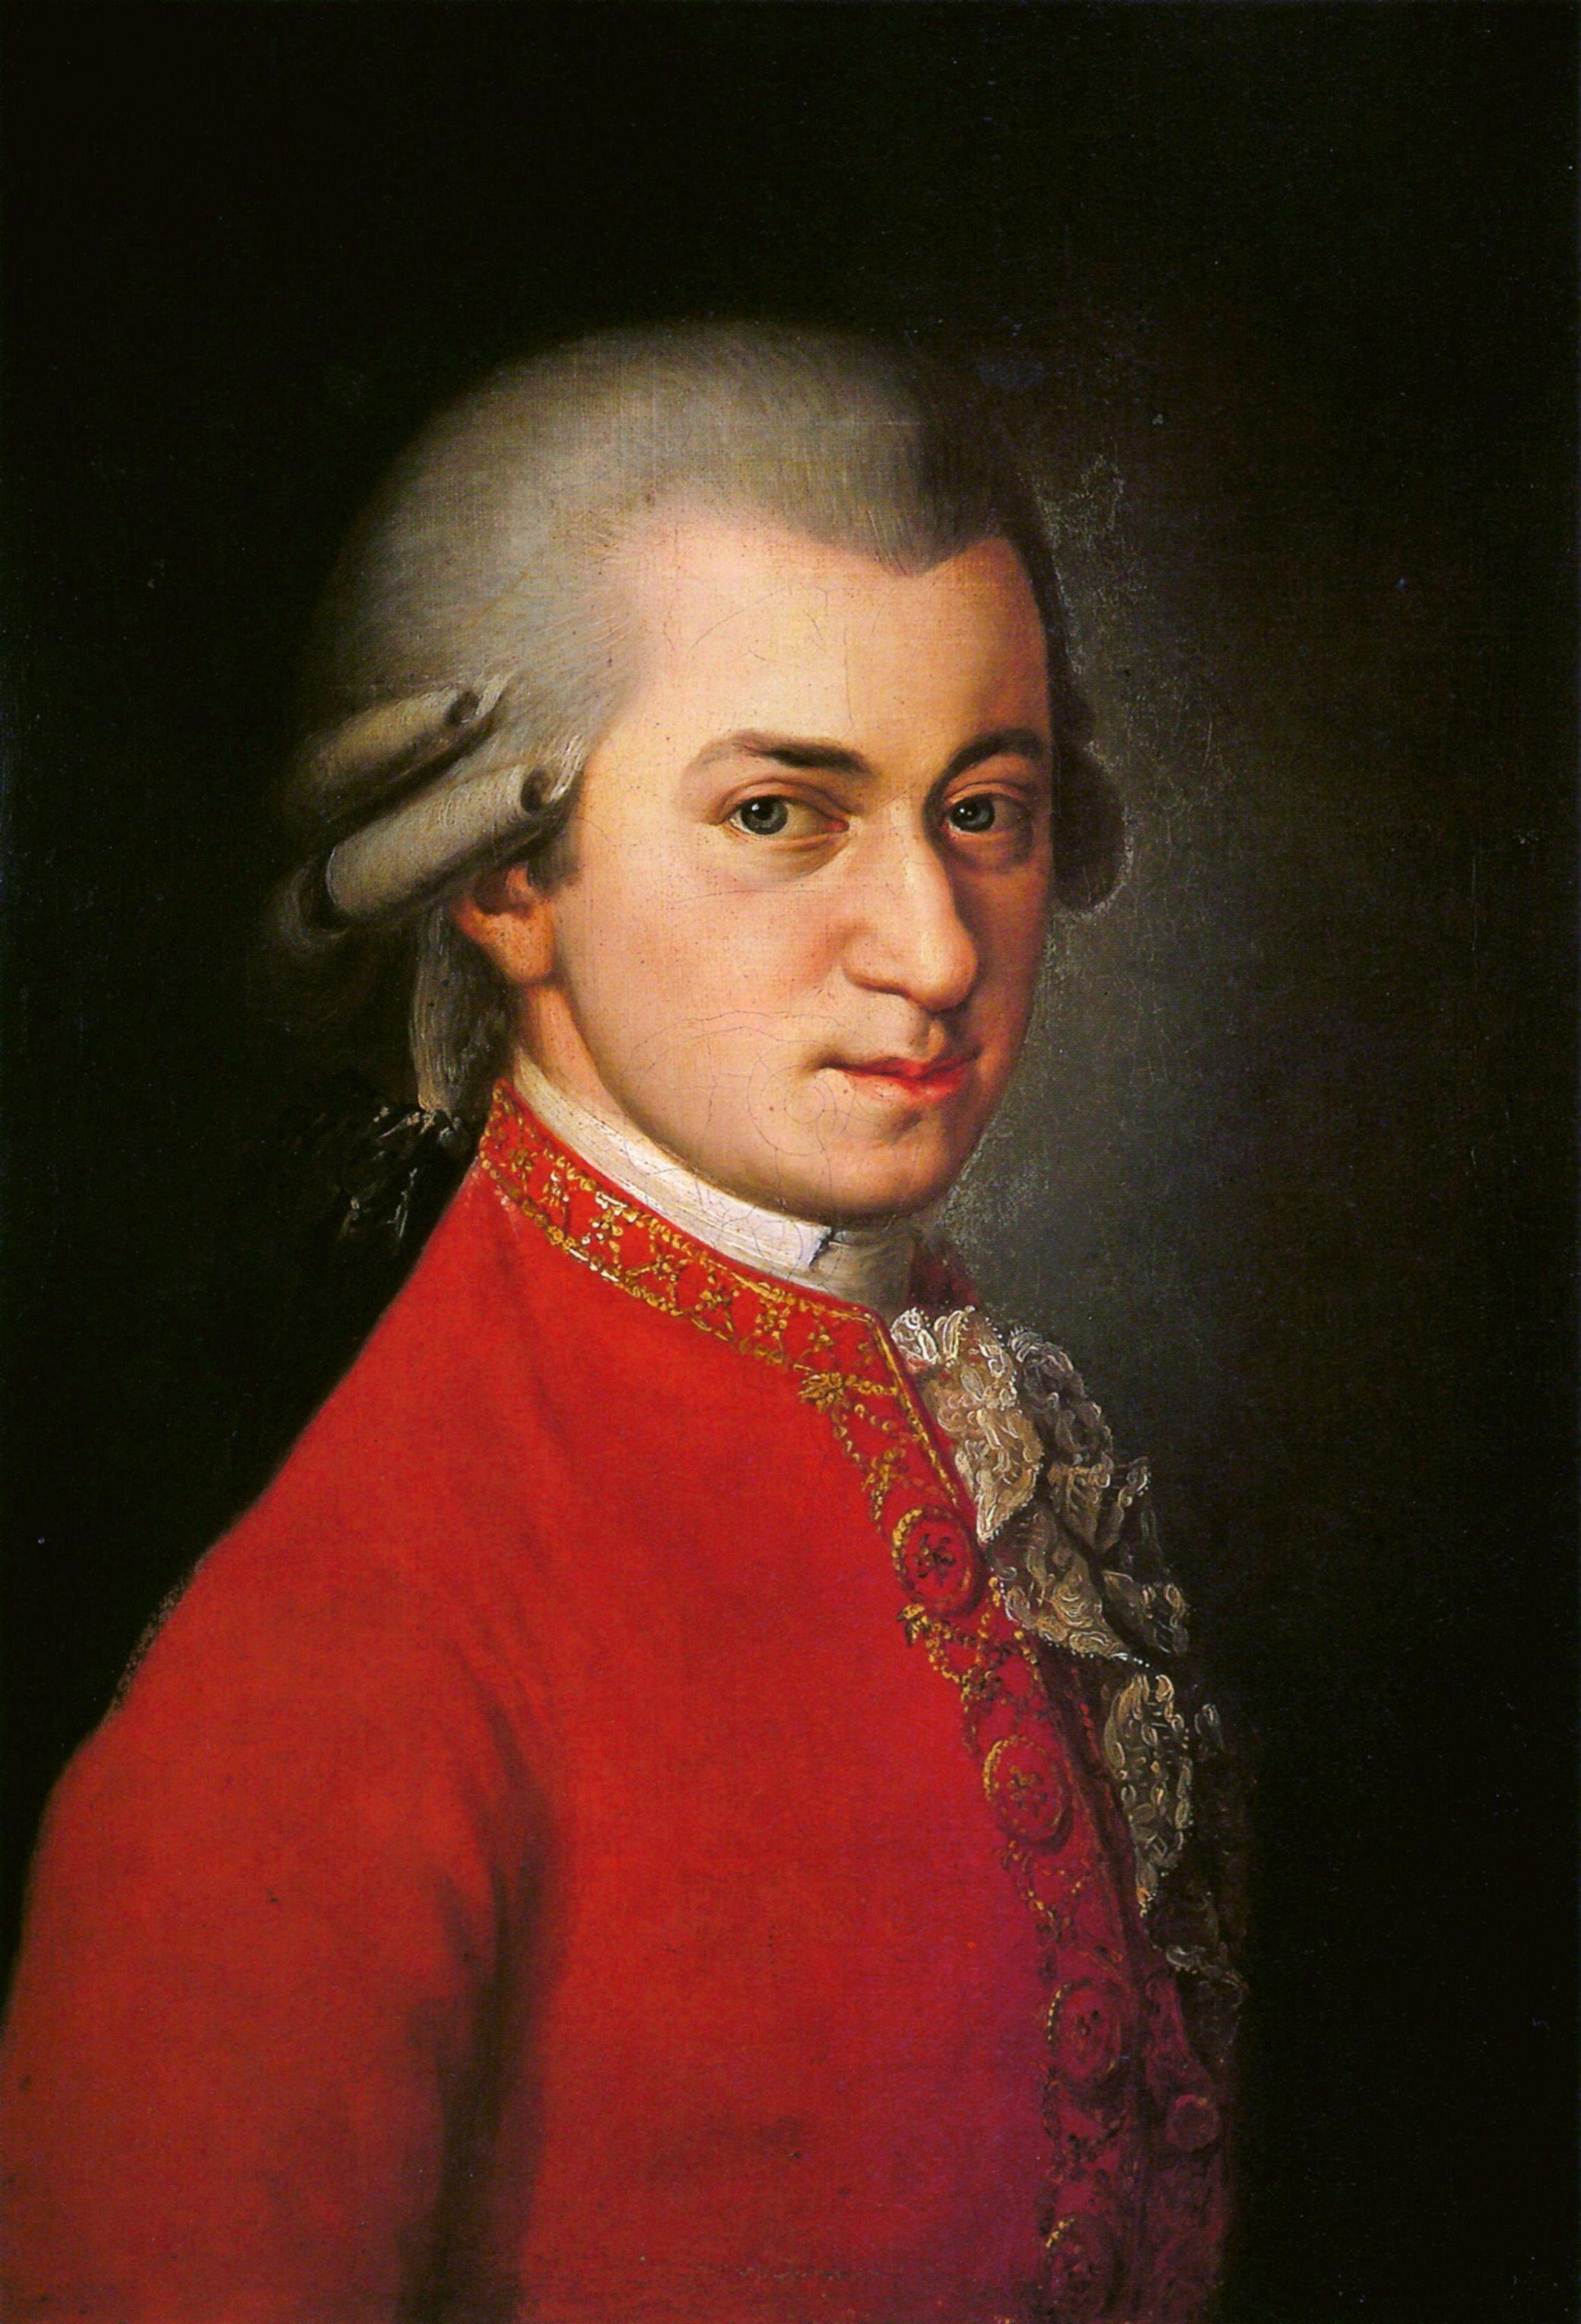 wolfgang amadeus mozart - Symphony No. 41 in C Major, K 551 (Jupiter)IV. Molto AllegrettoTigran Arakelyan, Conductor